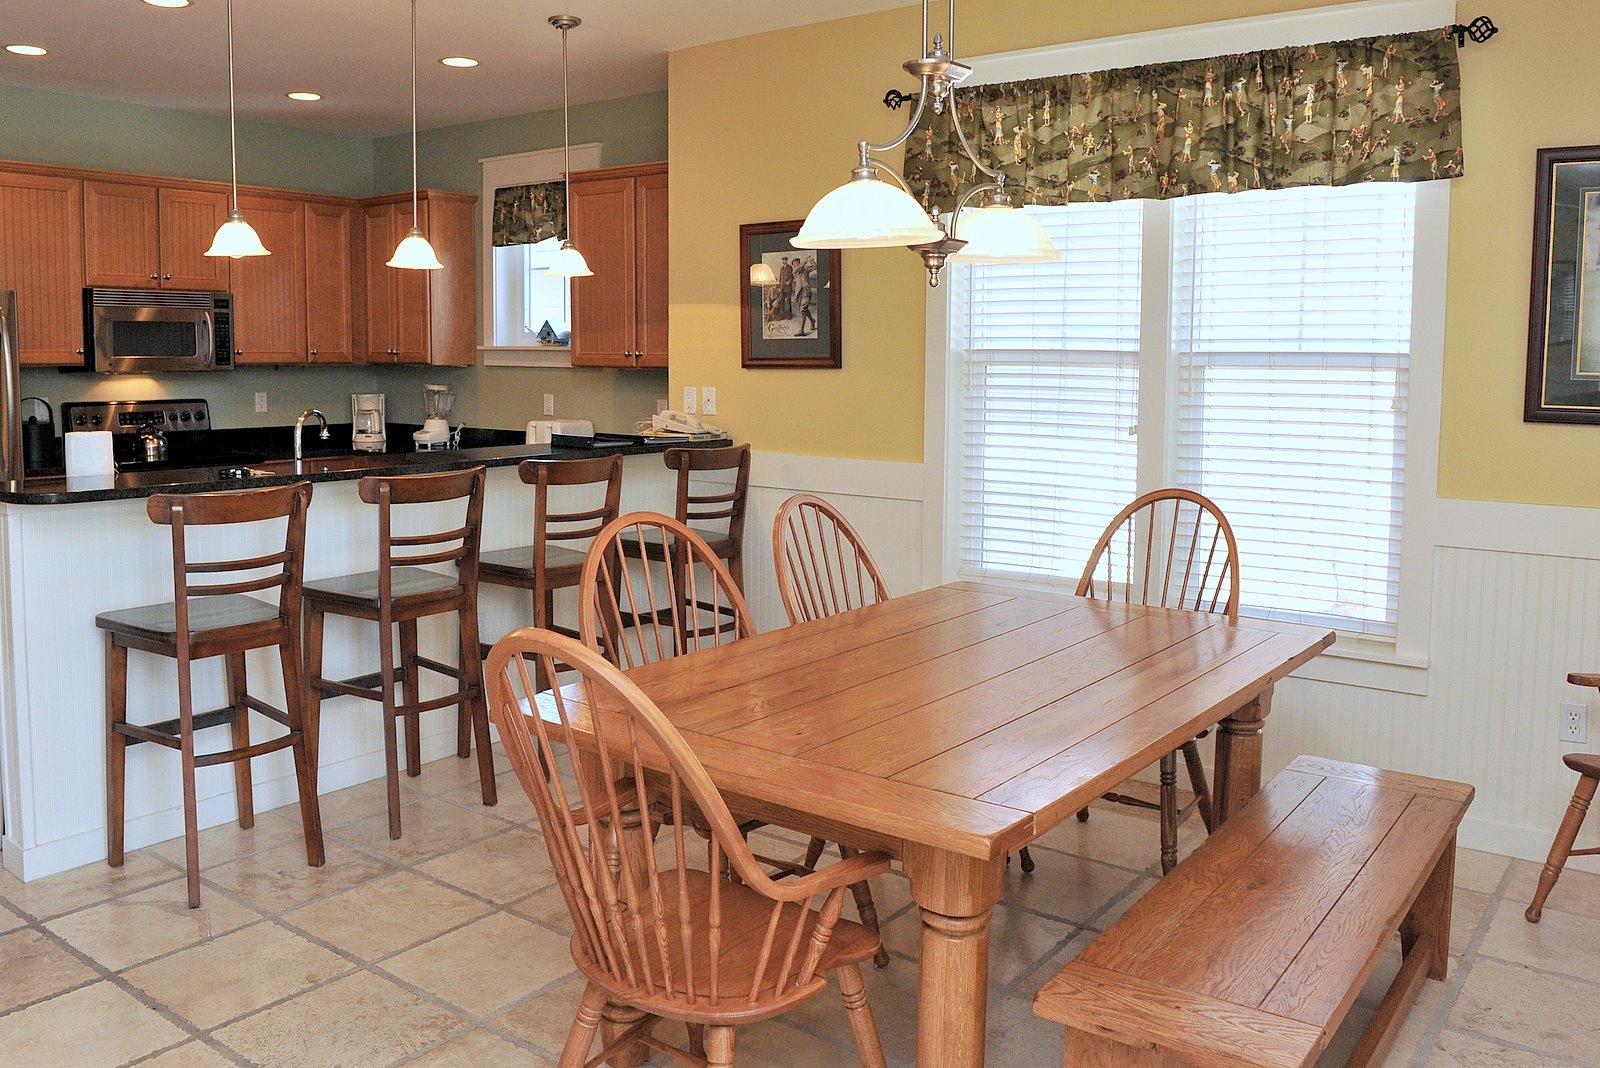 1280 Laurel Grove Condo rental in Sandestin Rentals ~ Cottages and Villas  in Destin Florida - #5